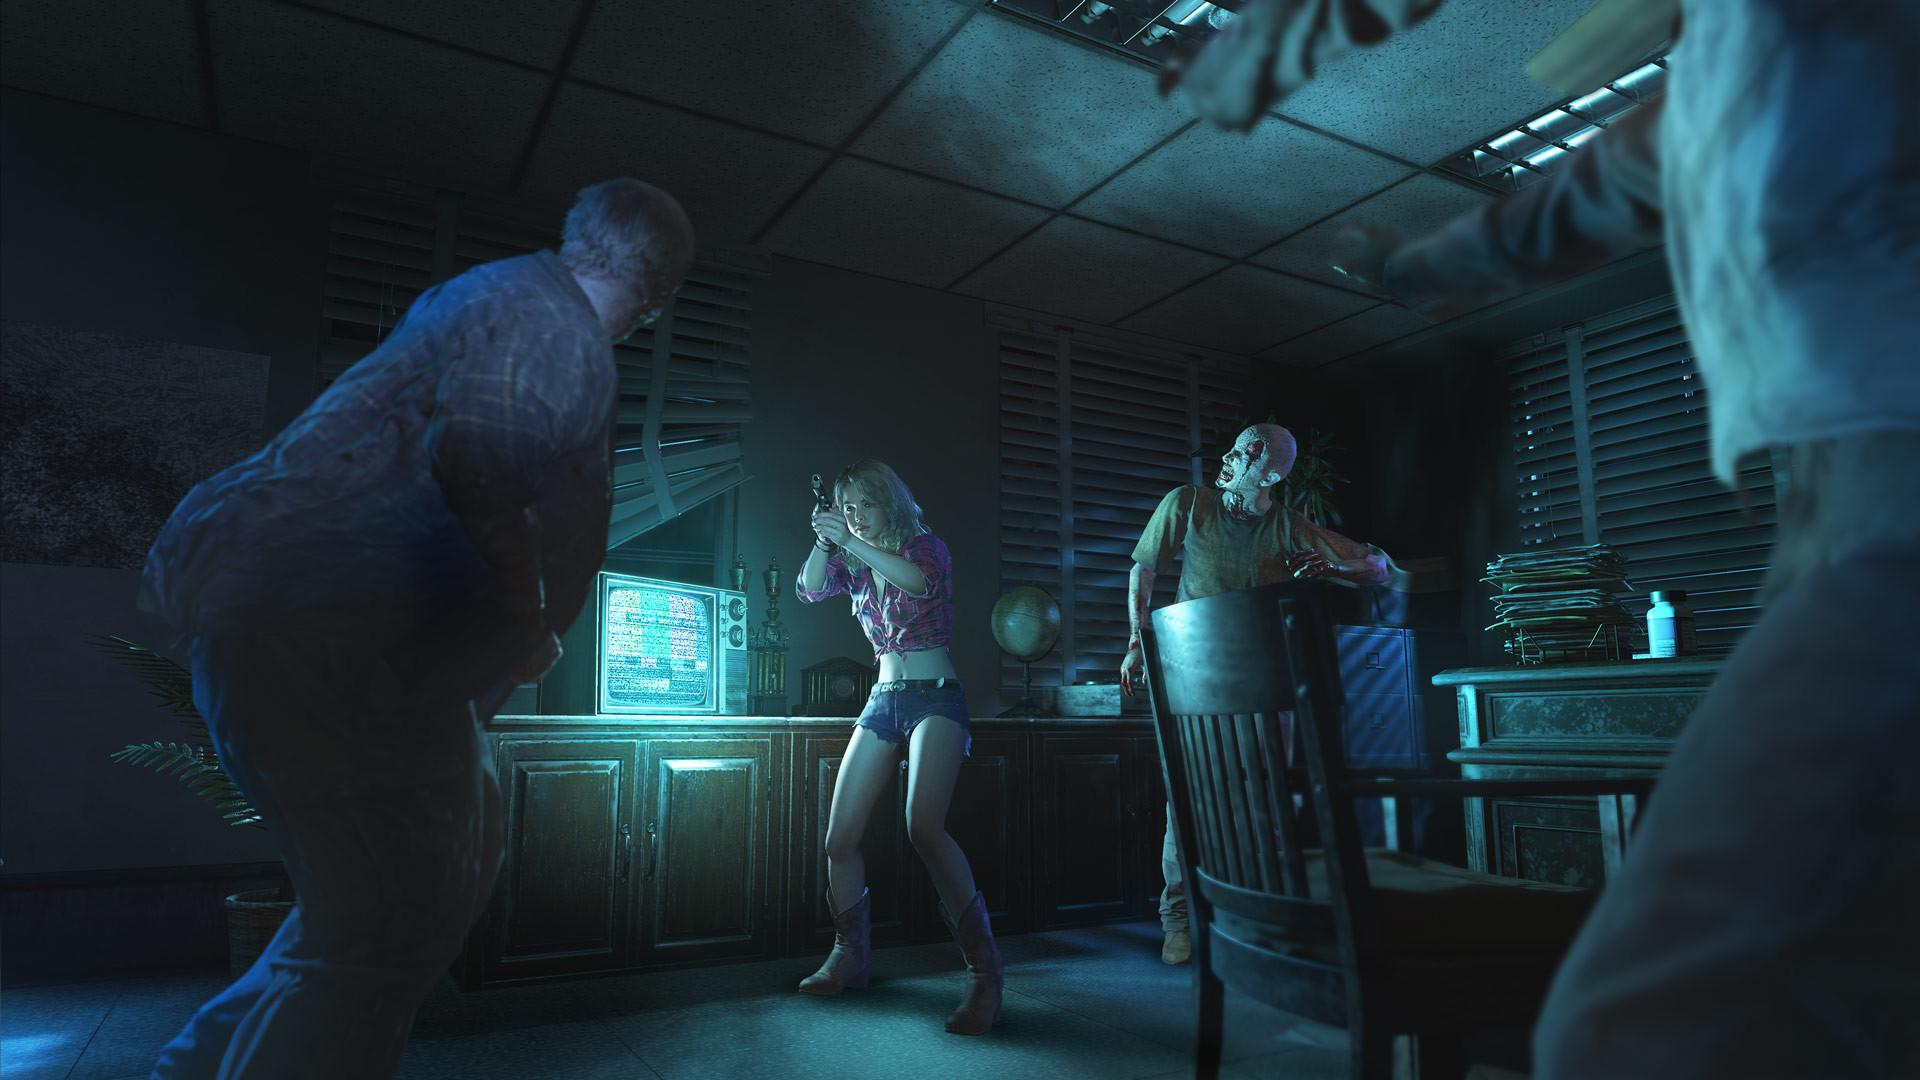 Best Ps4 games of 2020 - Resident Evil 3 remake